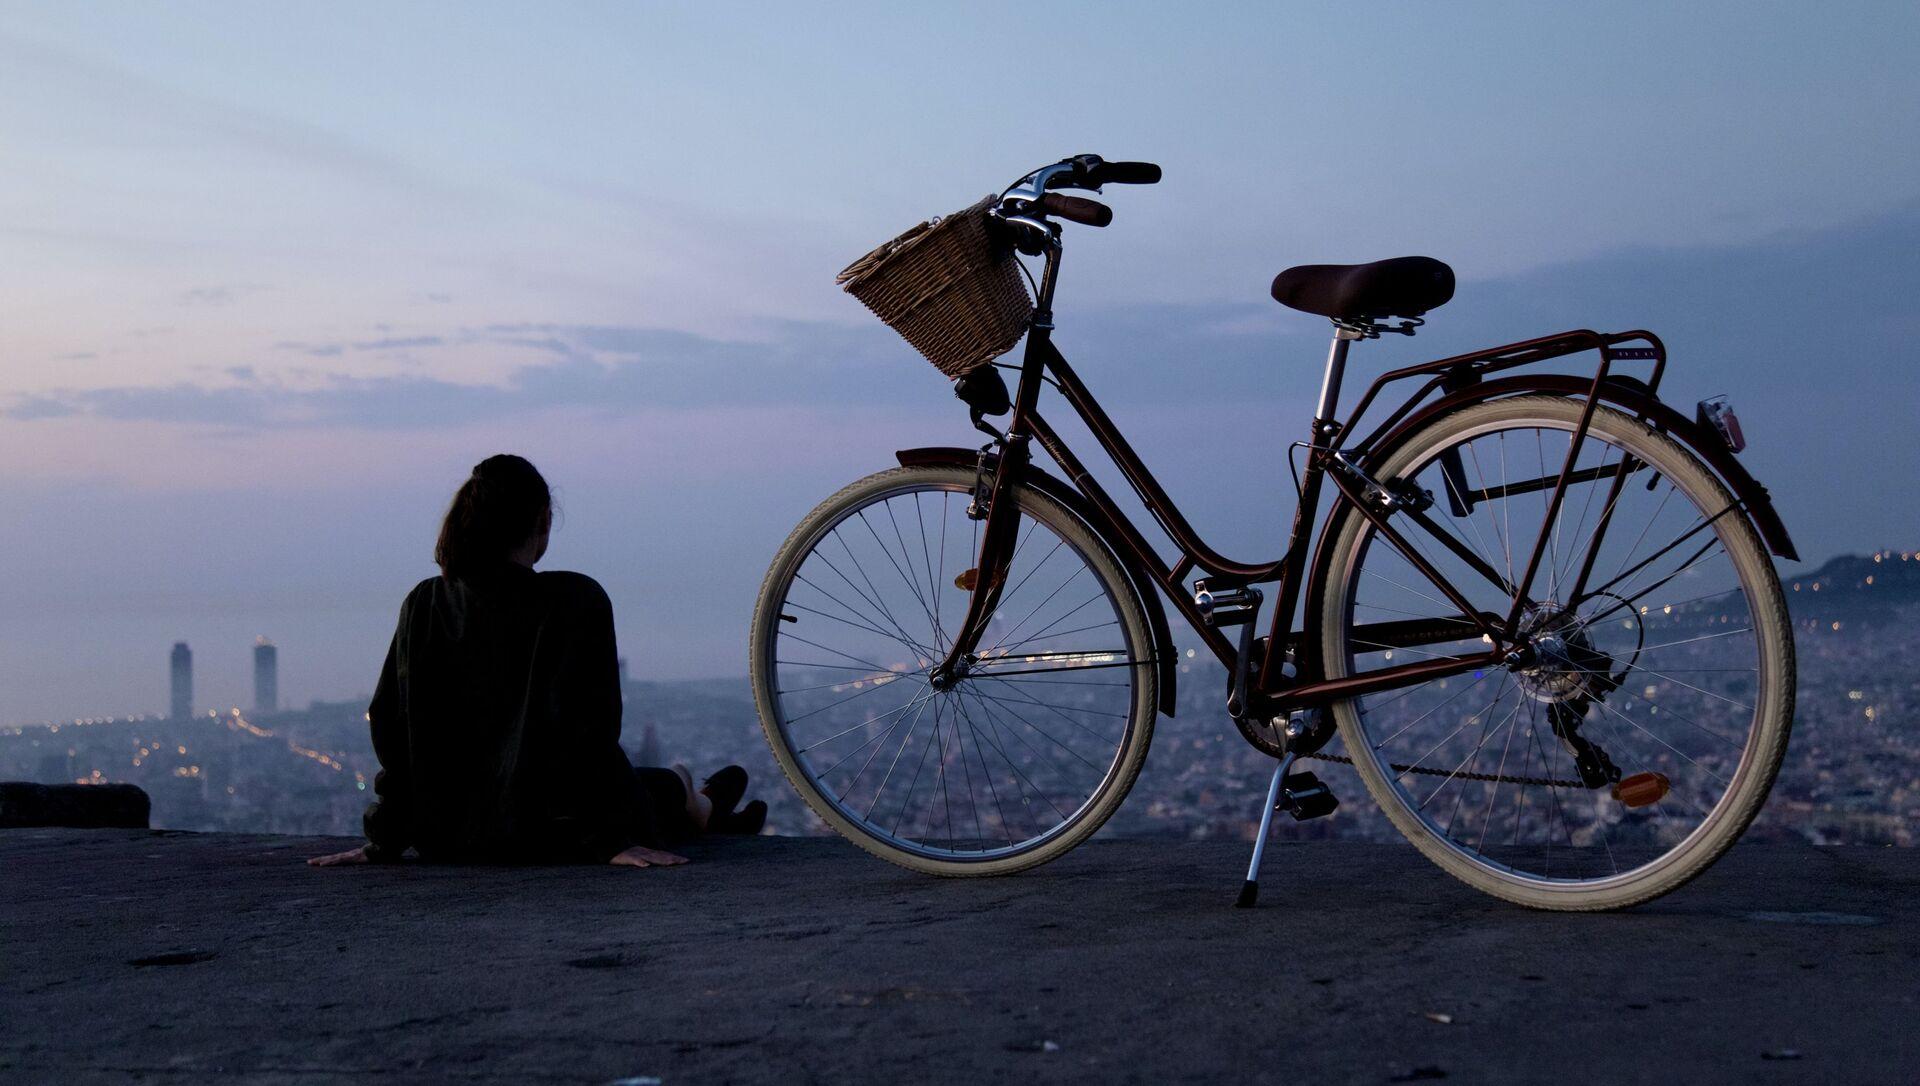 Una chica con bicicleta (imagen referencial) - Sputnik Mundo, 1920, 11.05.2020